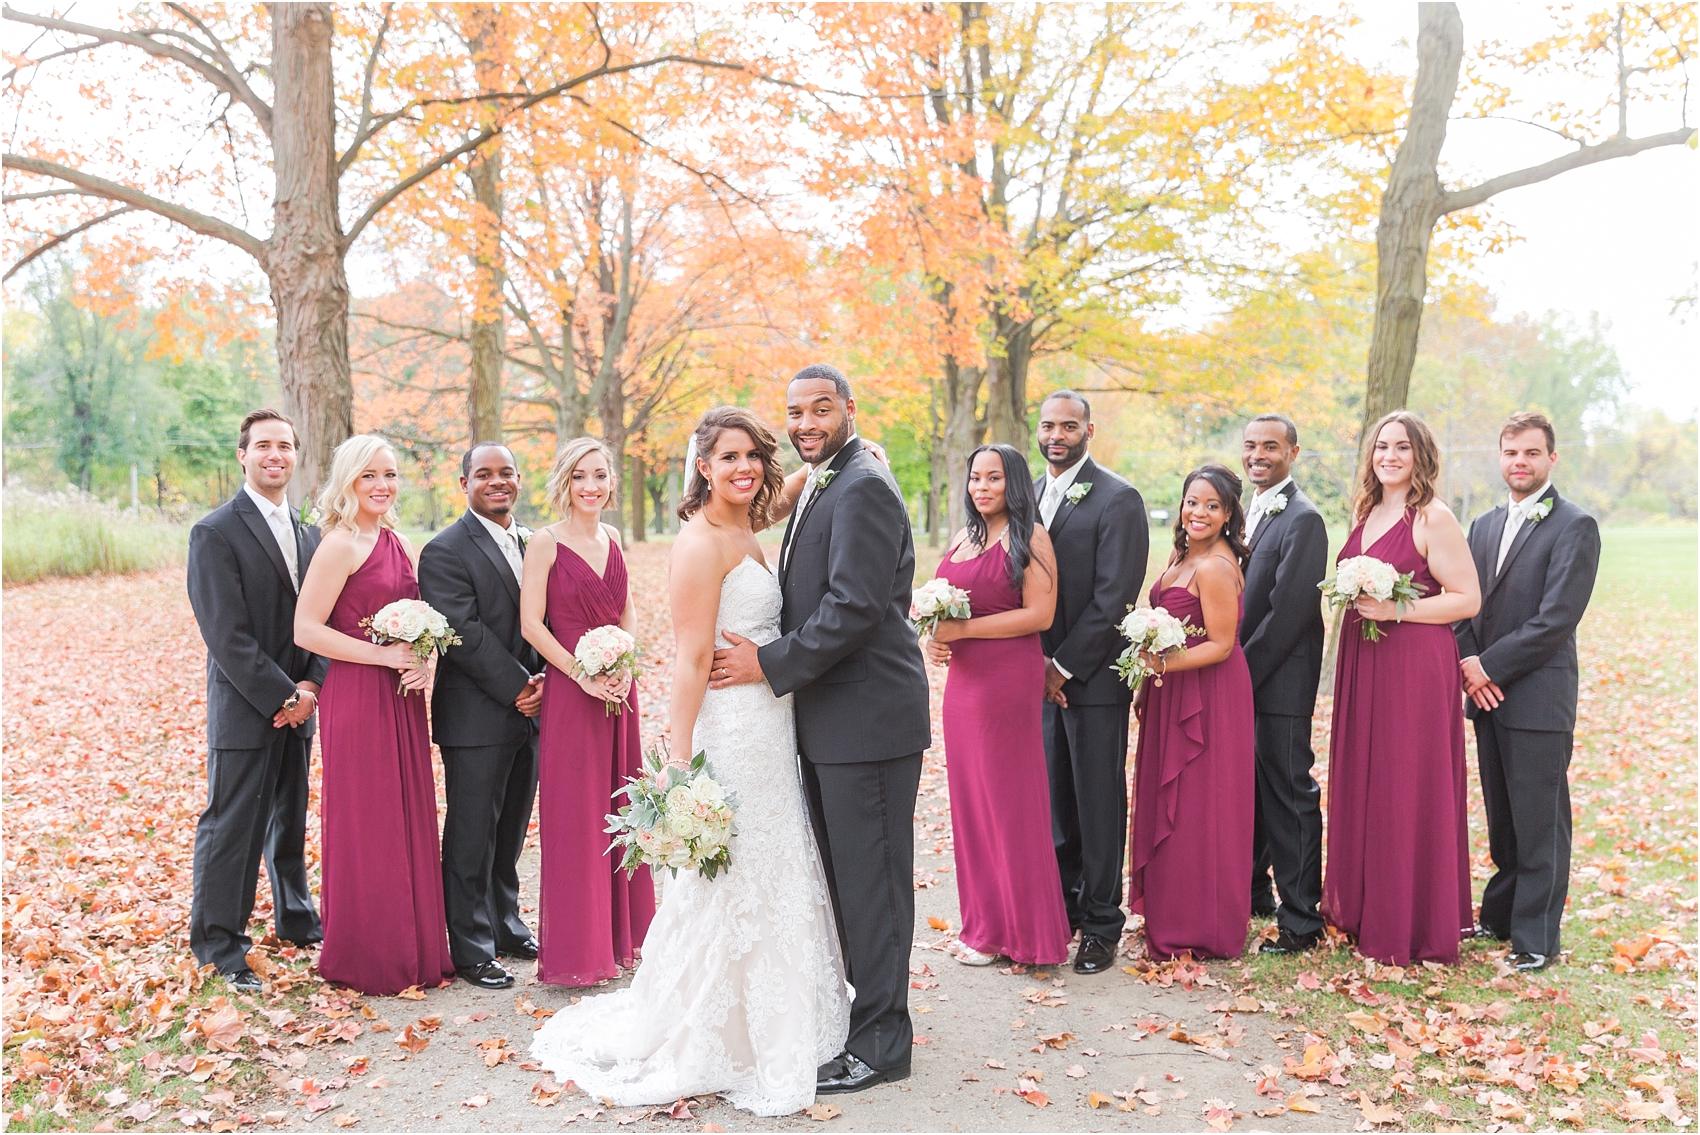 elegant-and-romantic-fall-wedding-photos-at-st-marys-catholic-church-in-monroe-michigan-by-courtney-carolyn-photography_0033.jpg